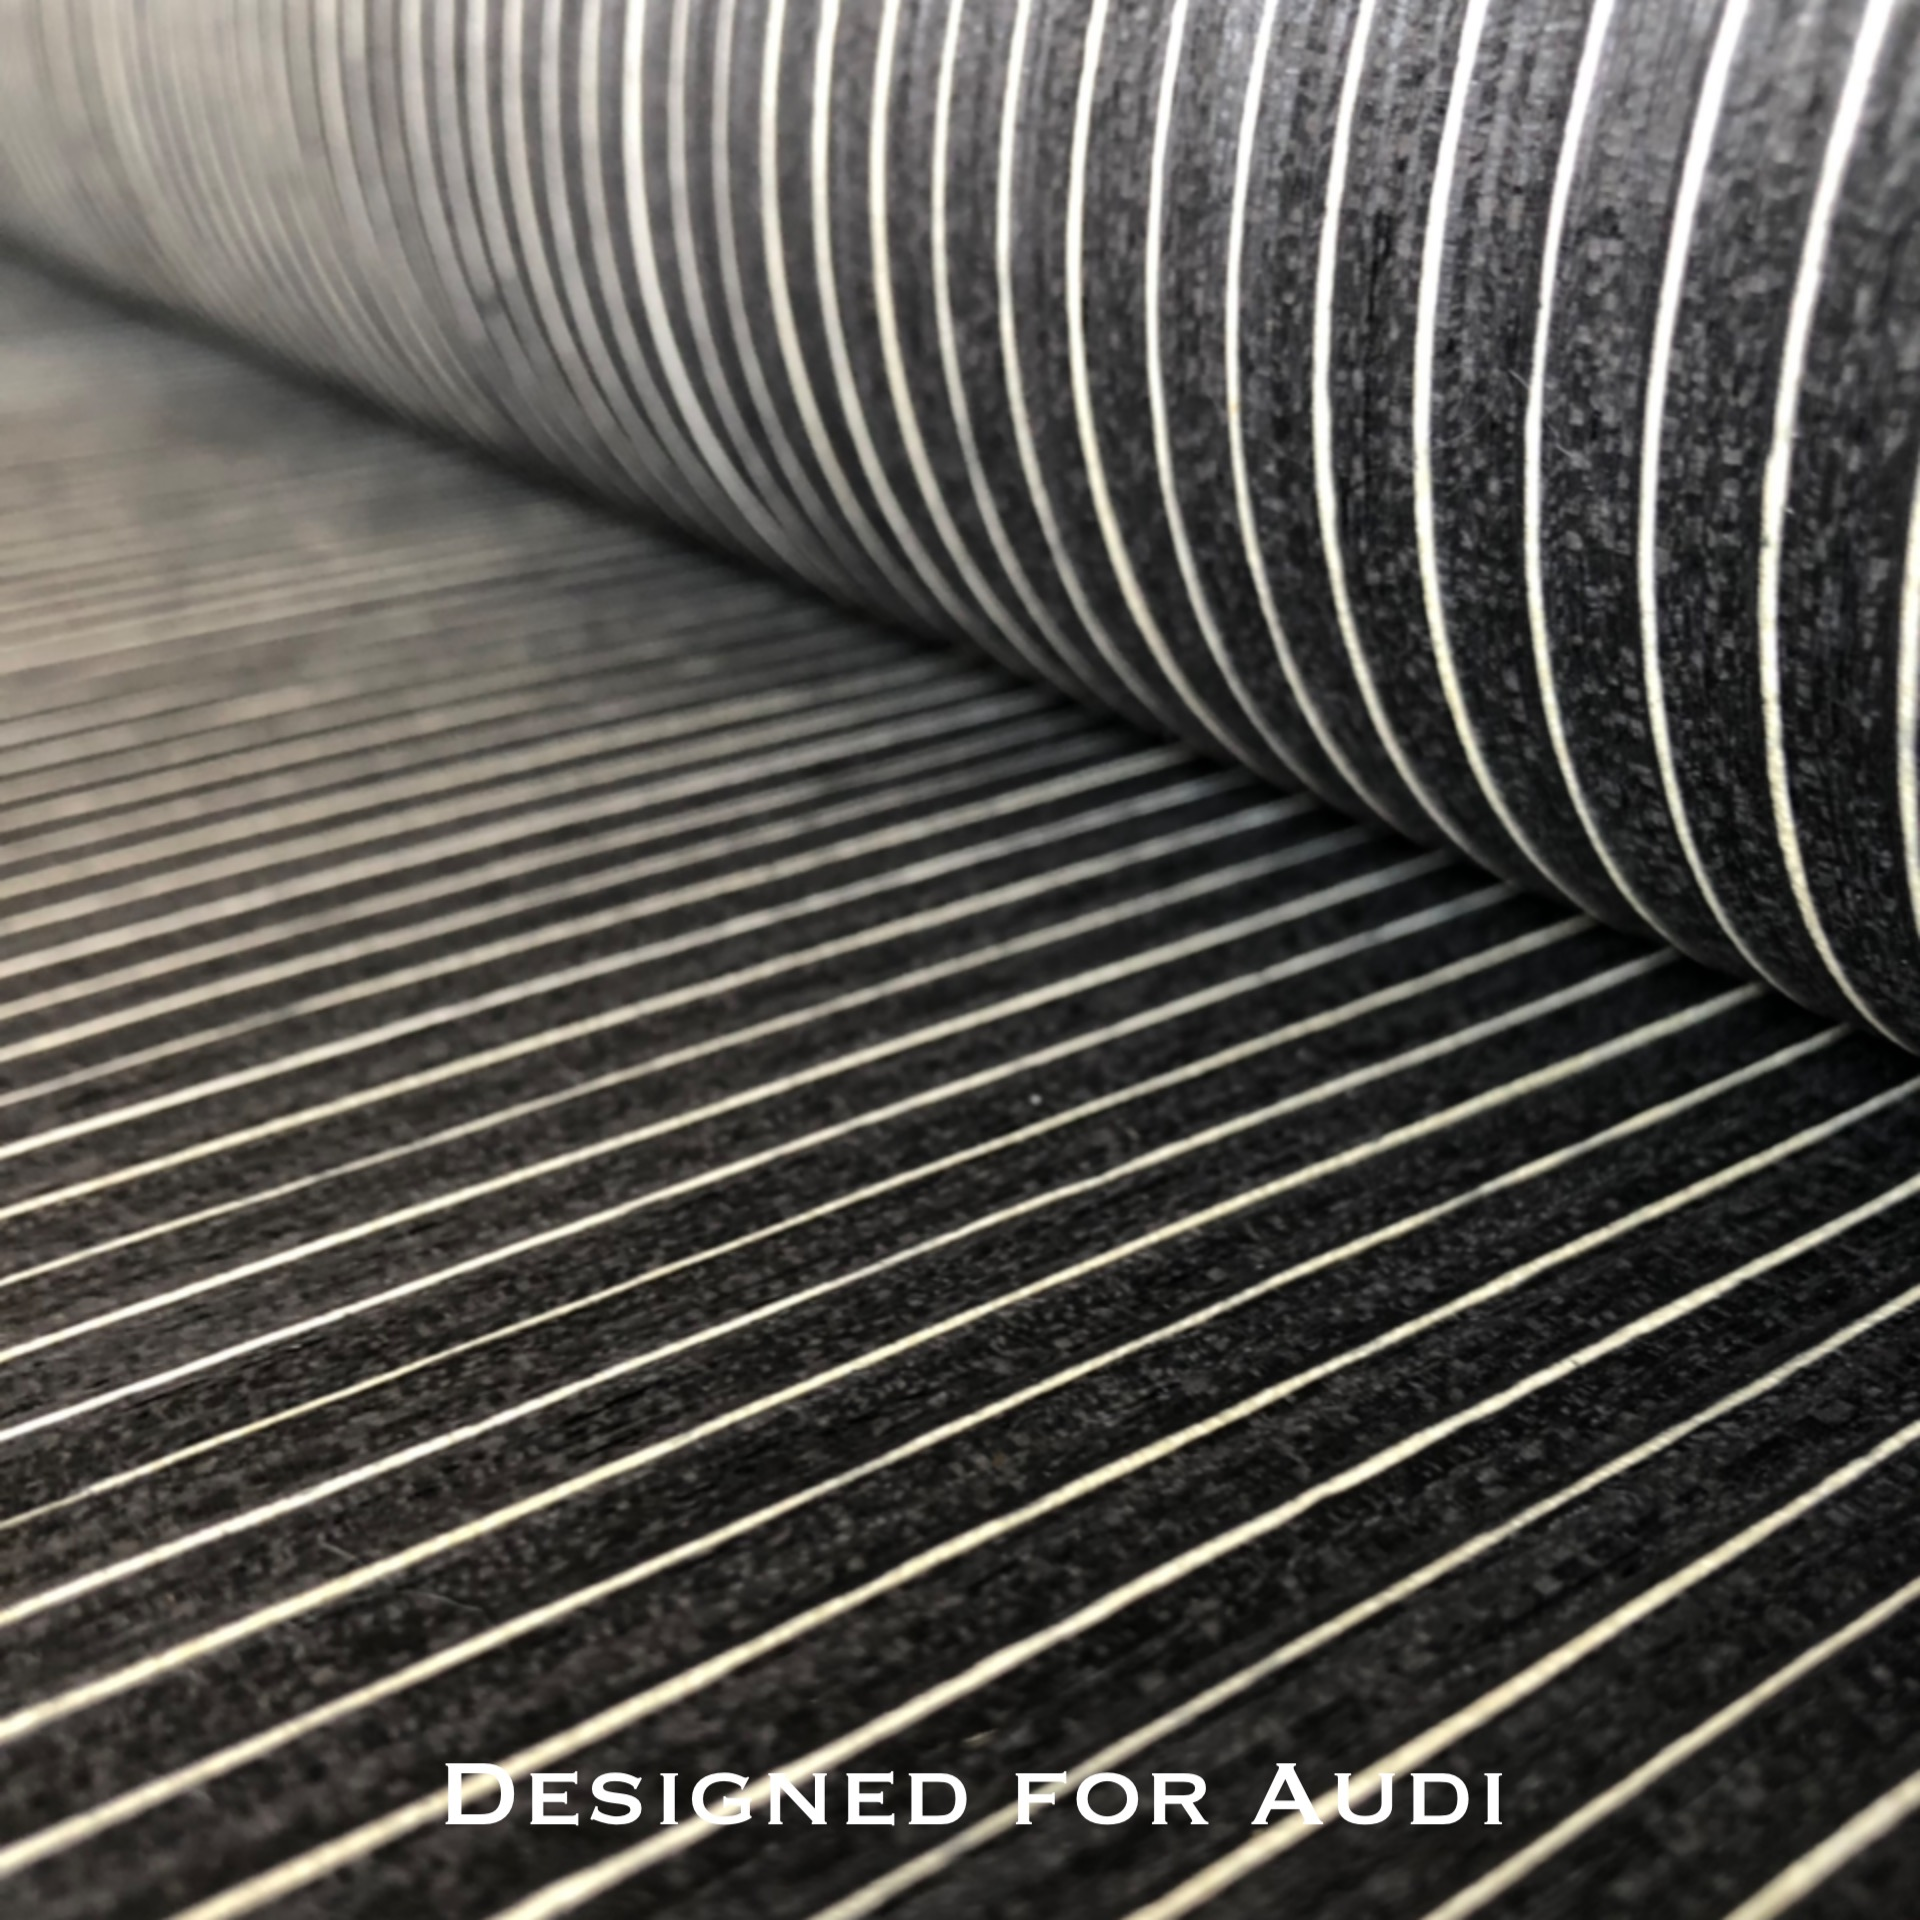 Audi Technical Veneer Sliced Wood Engineering Veneer E.V. 63cm X 2.5m Black Ebony Straight Grain Striped Q/C